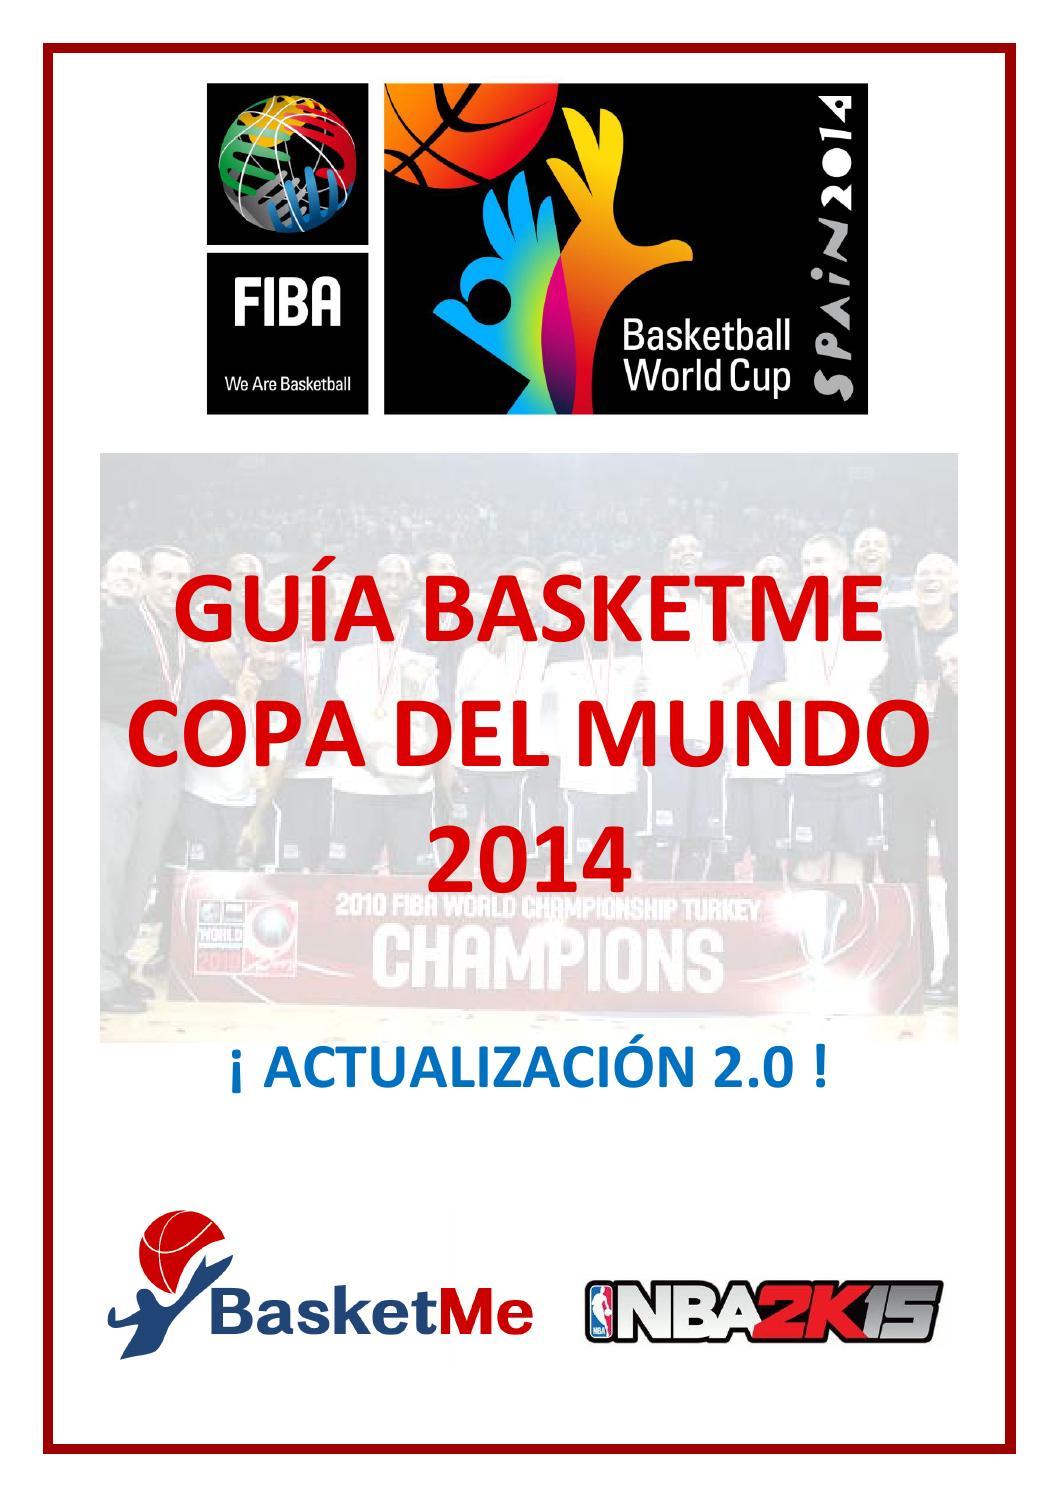 reputable site 6681a e61f9 Guía BasketMe Copa del Mundo 2014 - Actualización 2.0 by Xavier Garcia i  Sunyer - issuu